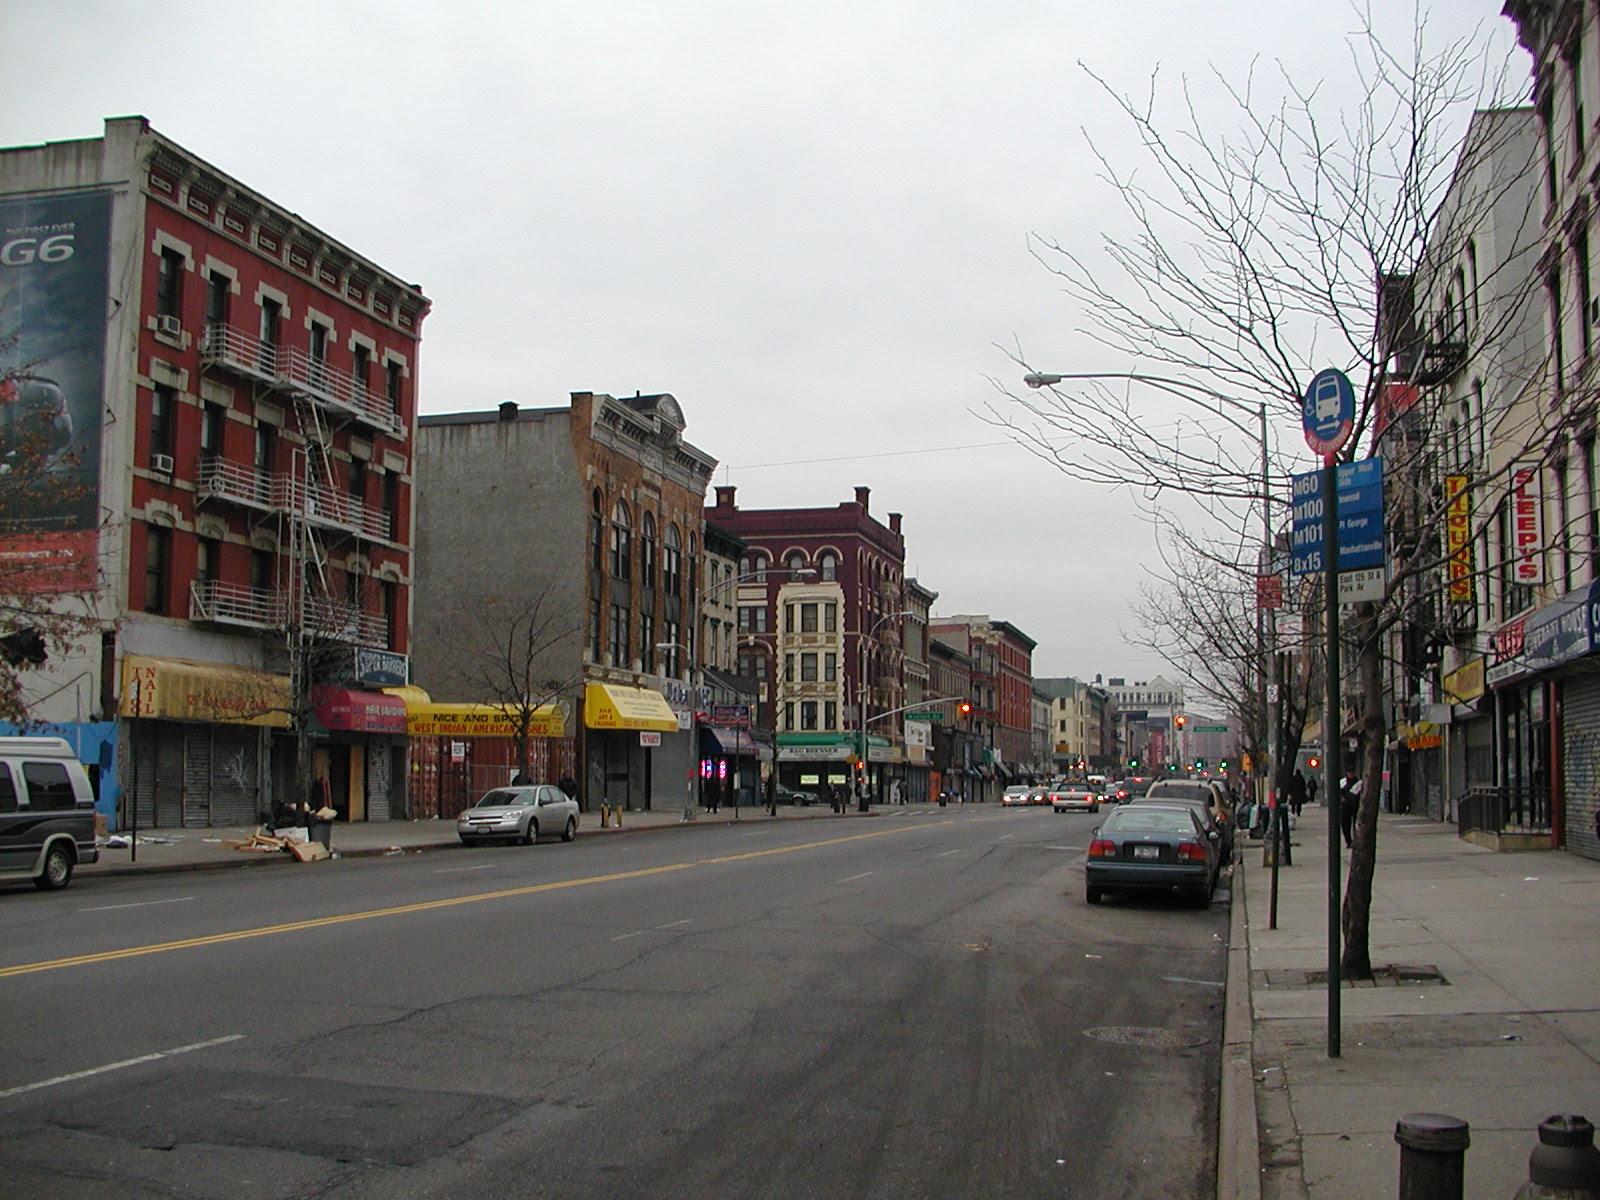 http://upload.wikimedia.org/wikipedia/commons/3/39/Harlem_-_W125st_-_Madison_Avenue.jpg